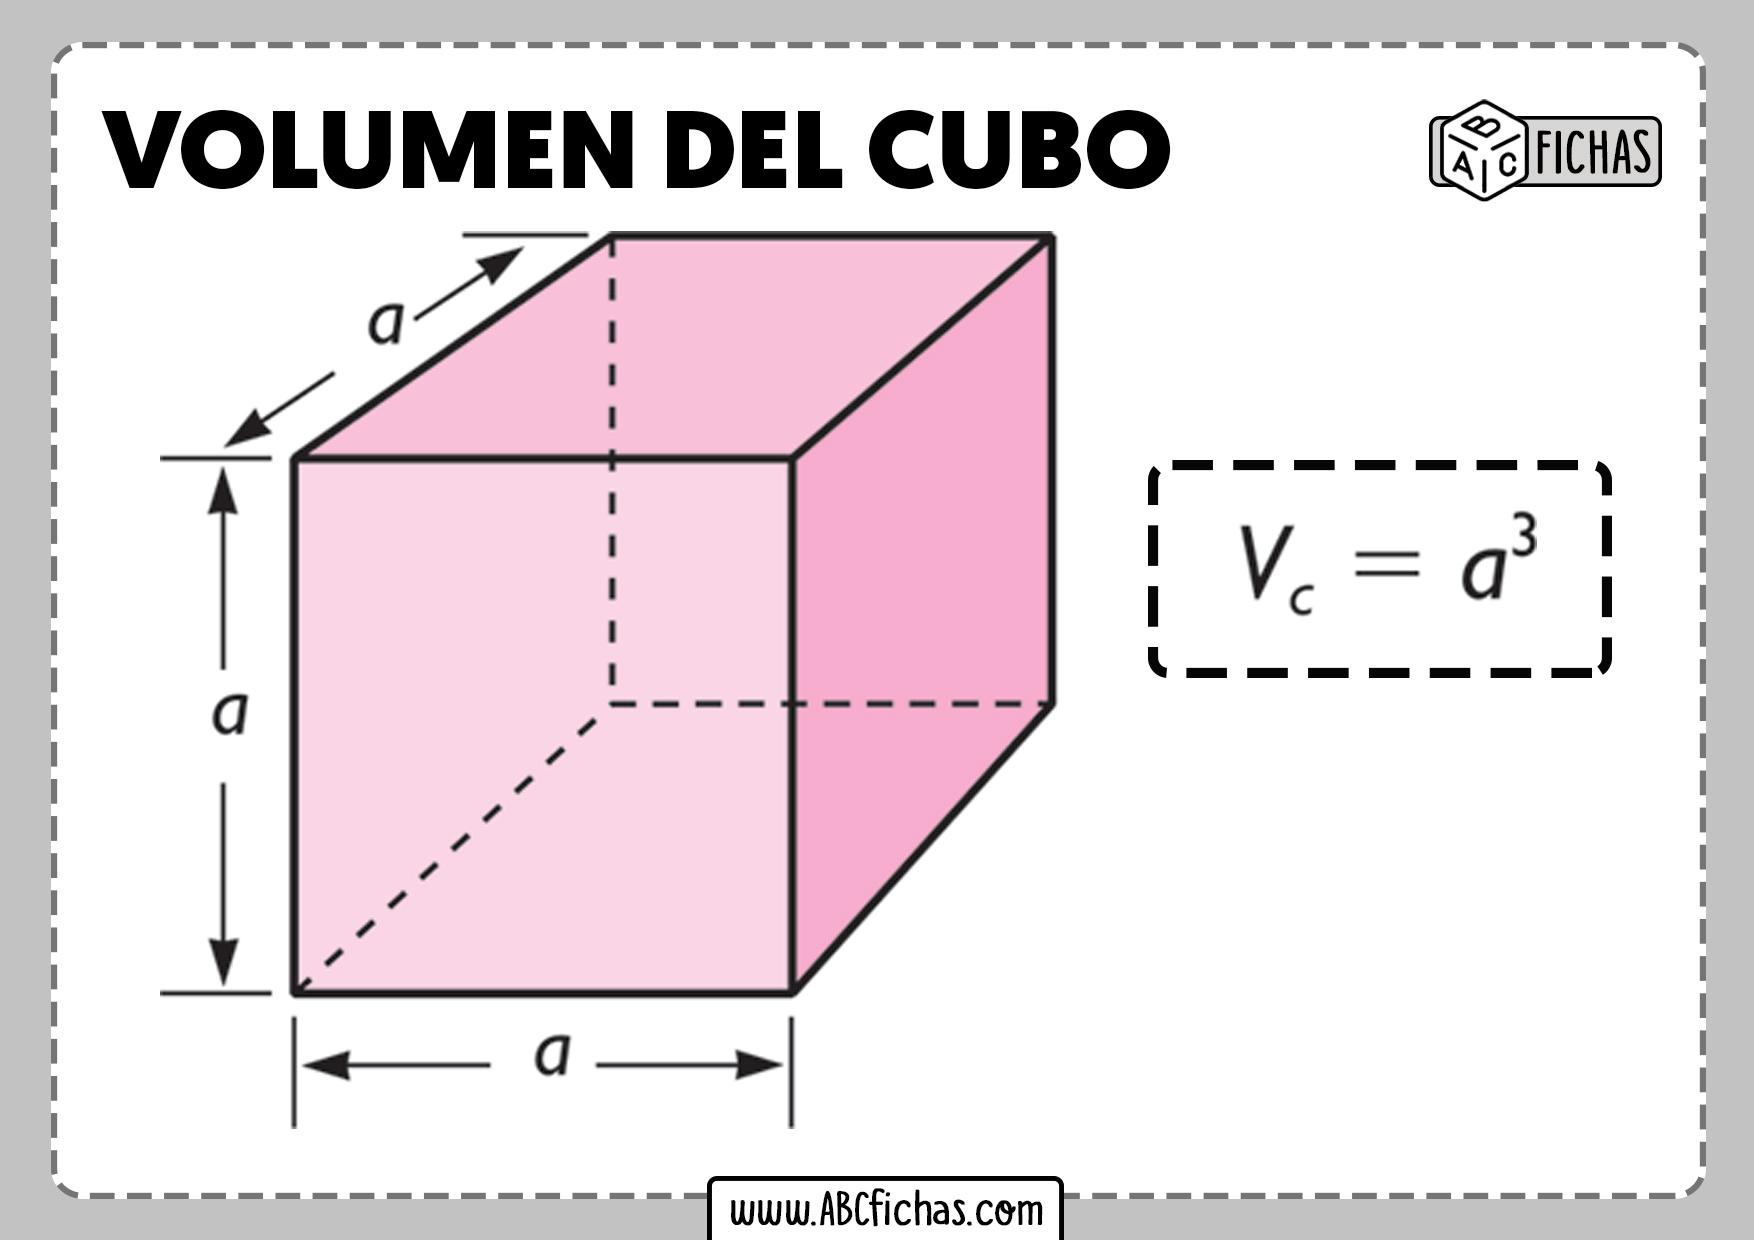 Volumen del cubo formula